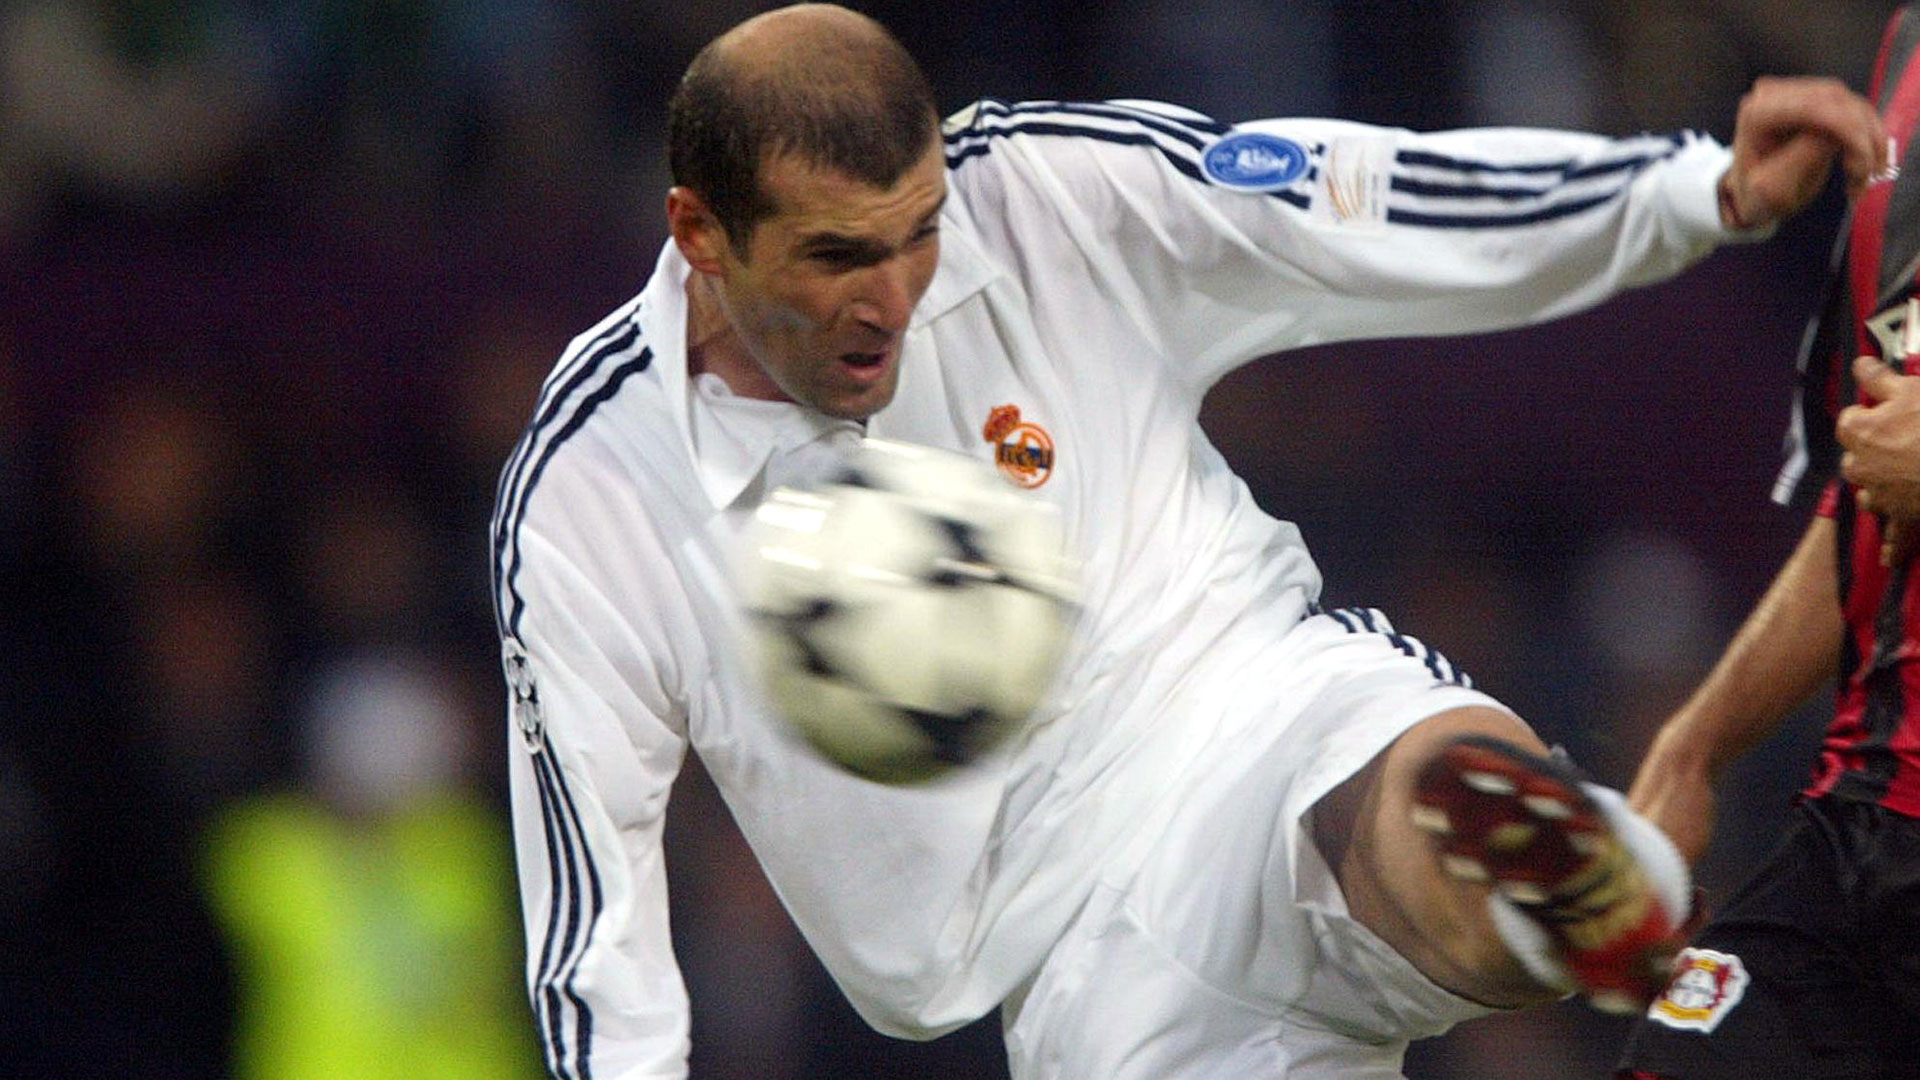 Zinedine Zidane Real Madrid Bayer Leverkusen 2002 Champions League final